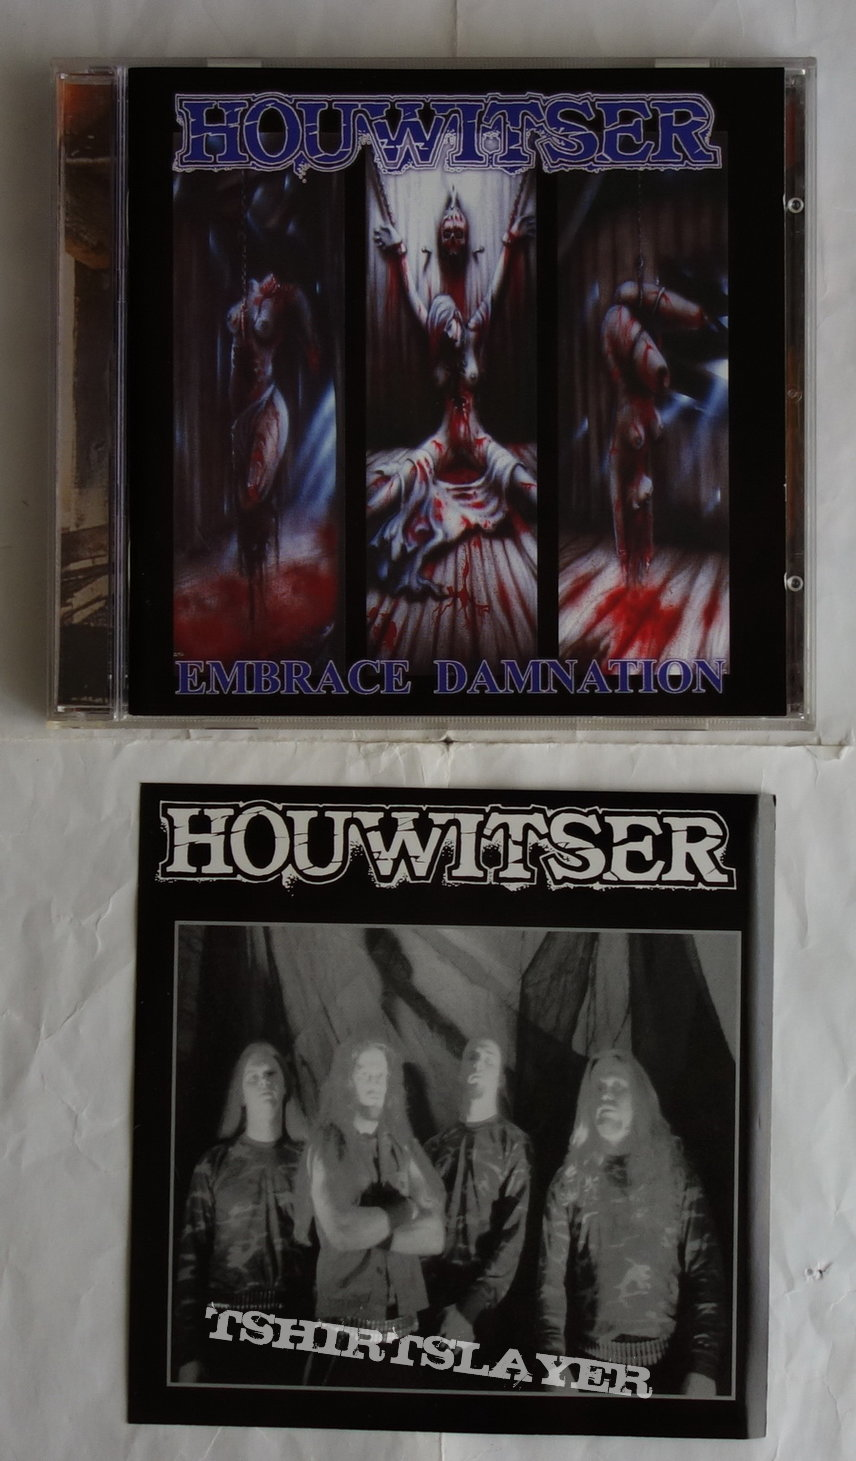 Houwitser - Embrace damnation - CD